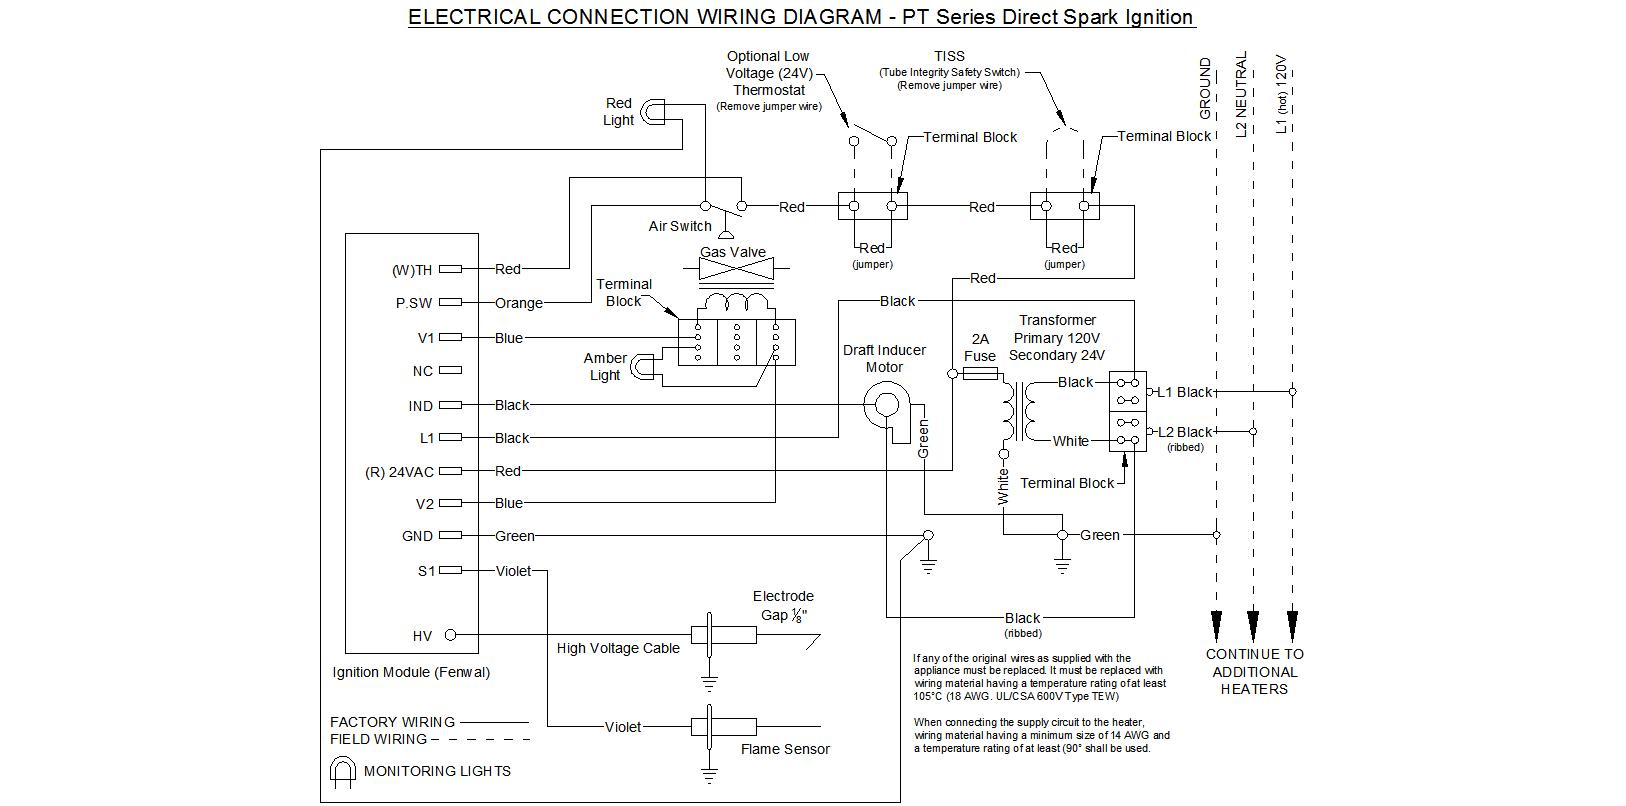 Power Cord Wiring Diagram A3729 Example Electrical Edenpure Heater Repair Service Elite Manual Caroldoey How Rh Funhouse Camerashop Pw 110 Colors